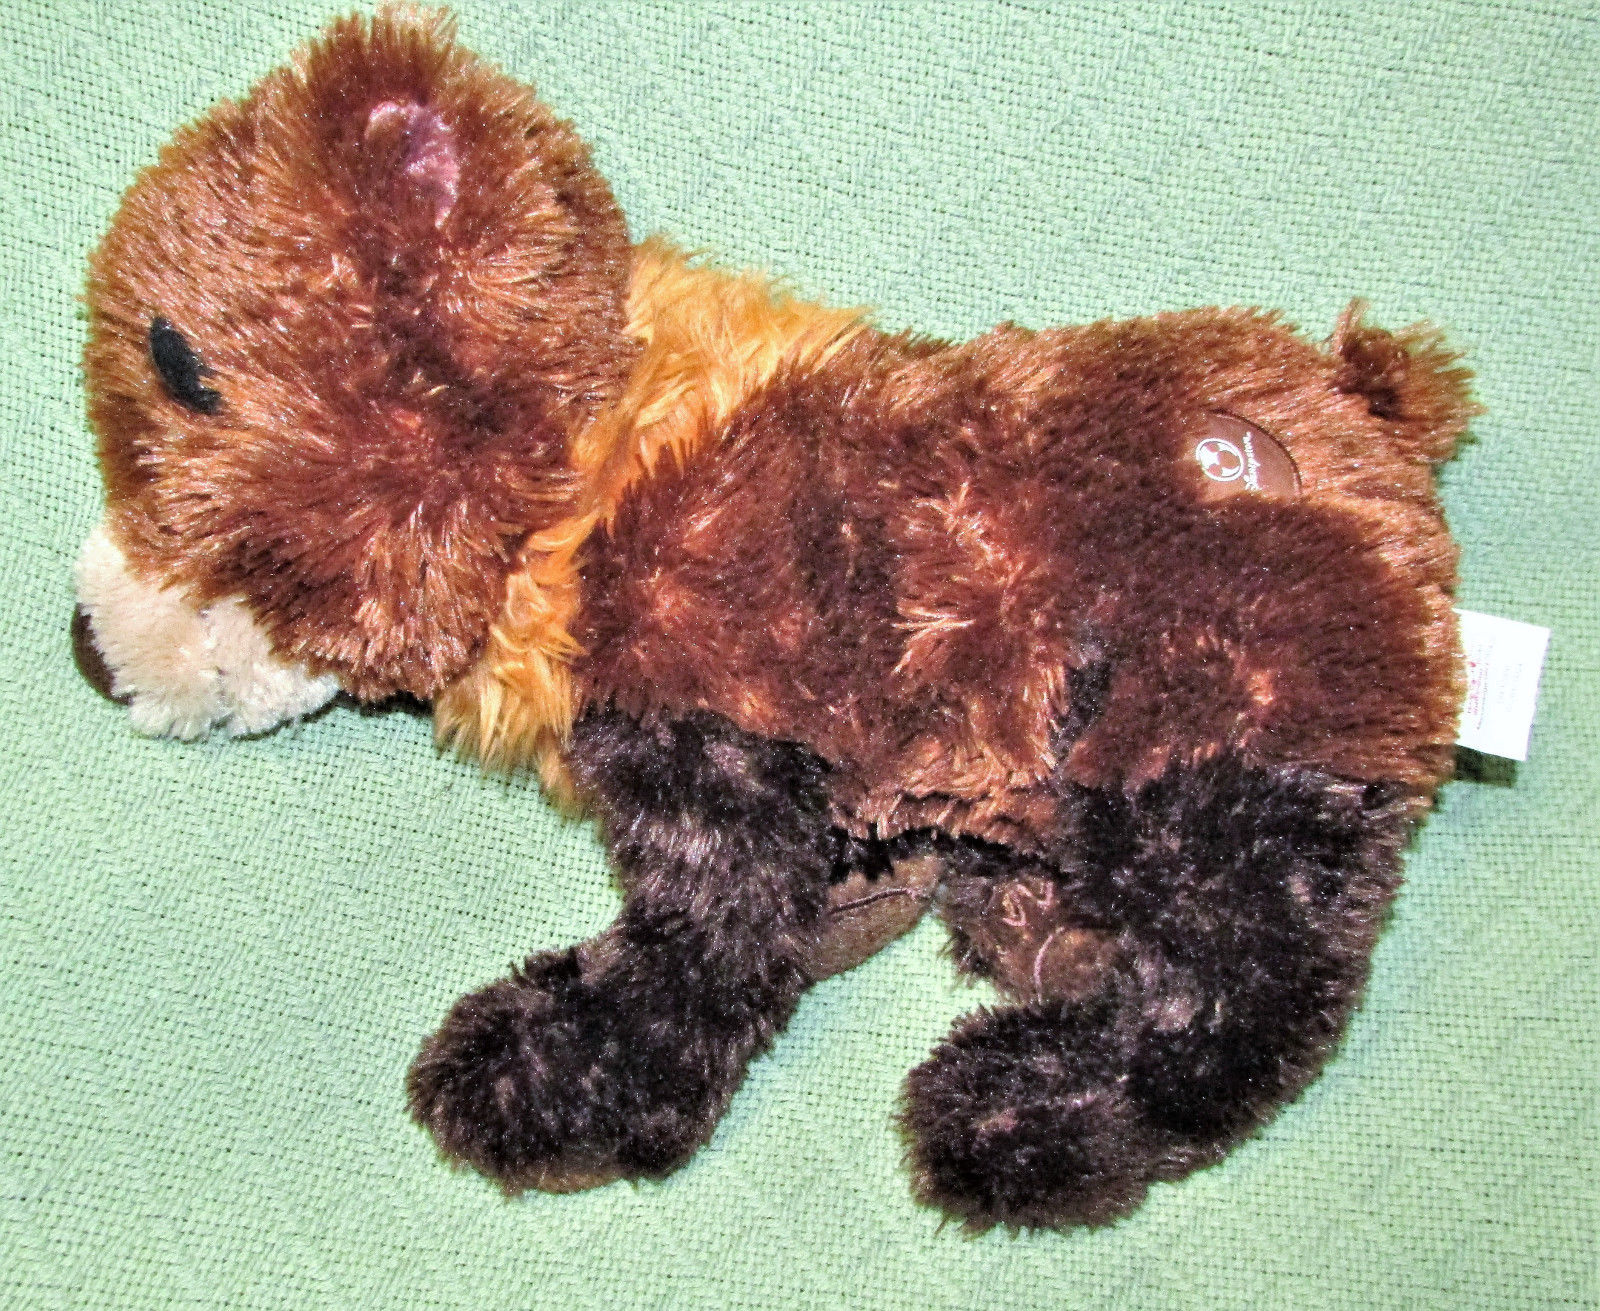 "Disney Brother Bear KODA Plush Brown Bear Floppy Bean Bag Stuffed Animal 12"" Toy"